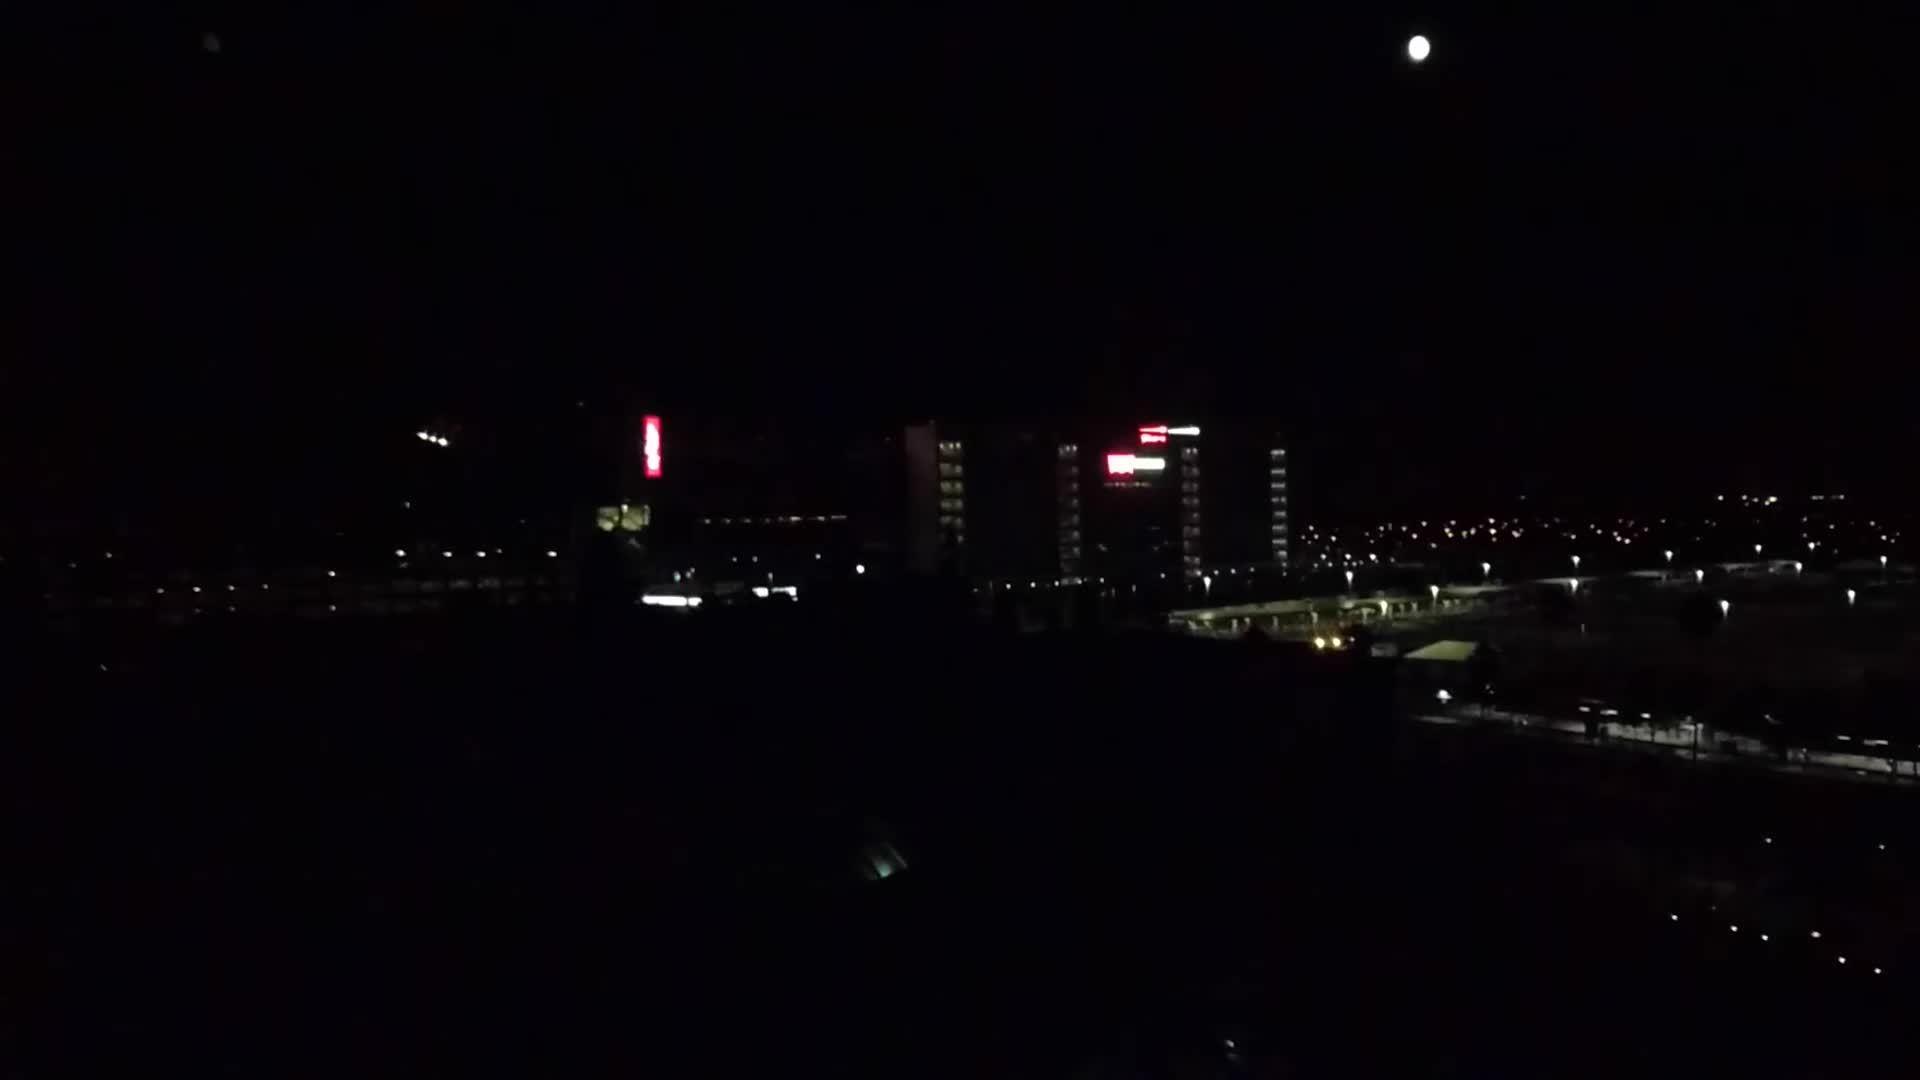 whatisthisthing, Blinking lights on Levi's Stadium (home of the 49ers) in Santa Clara (reddit) GIFs